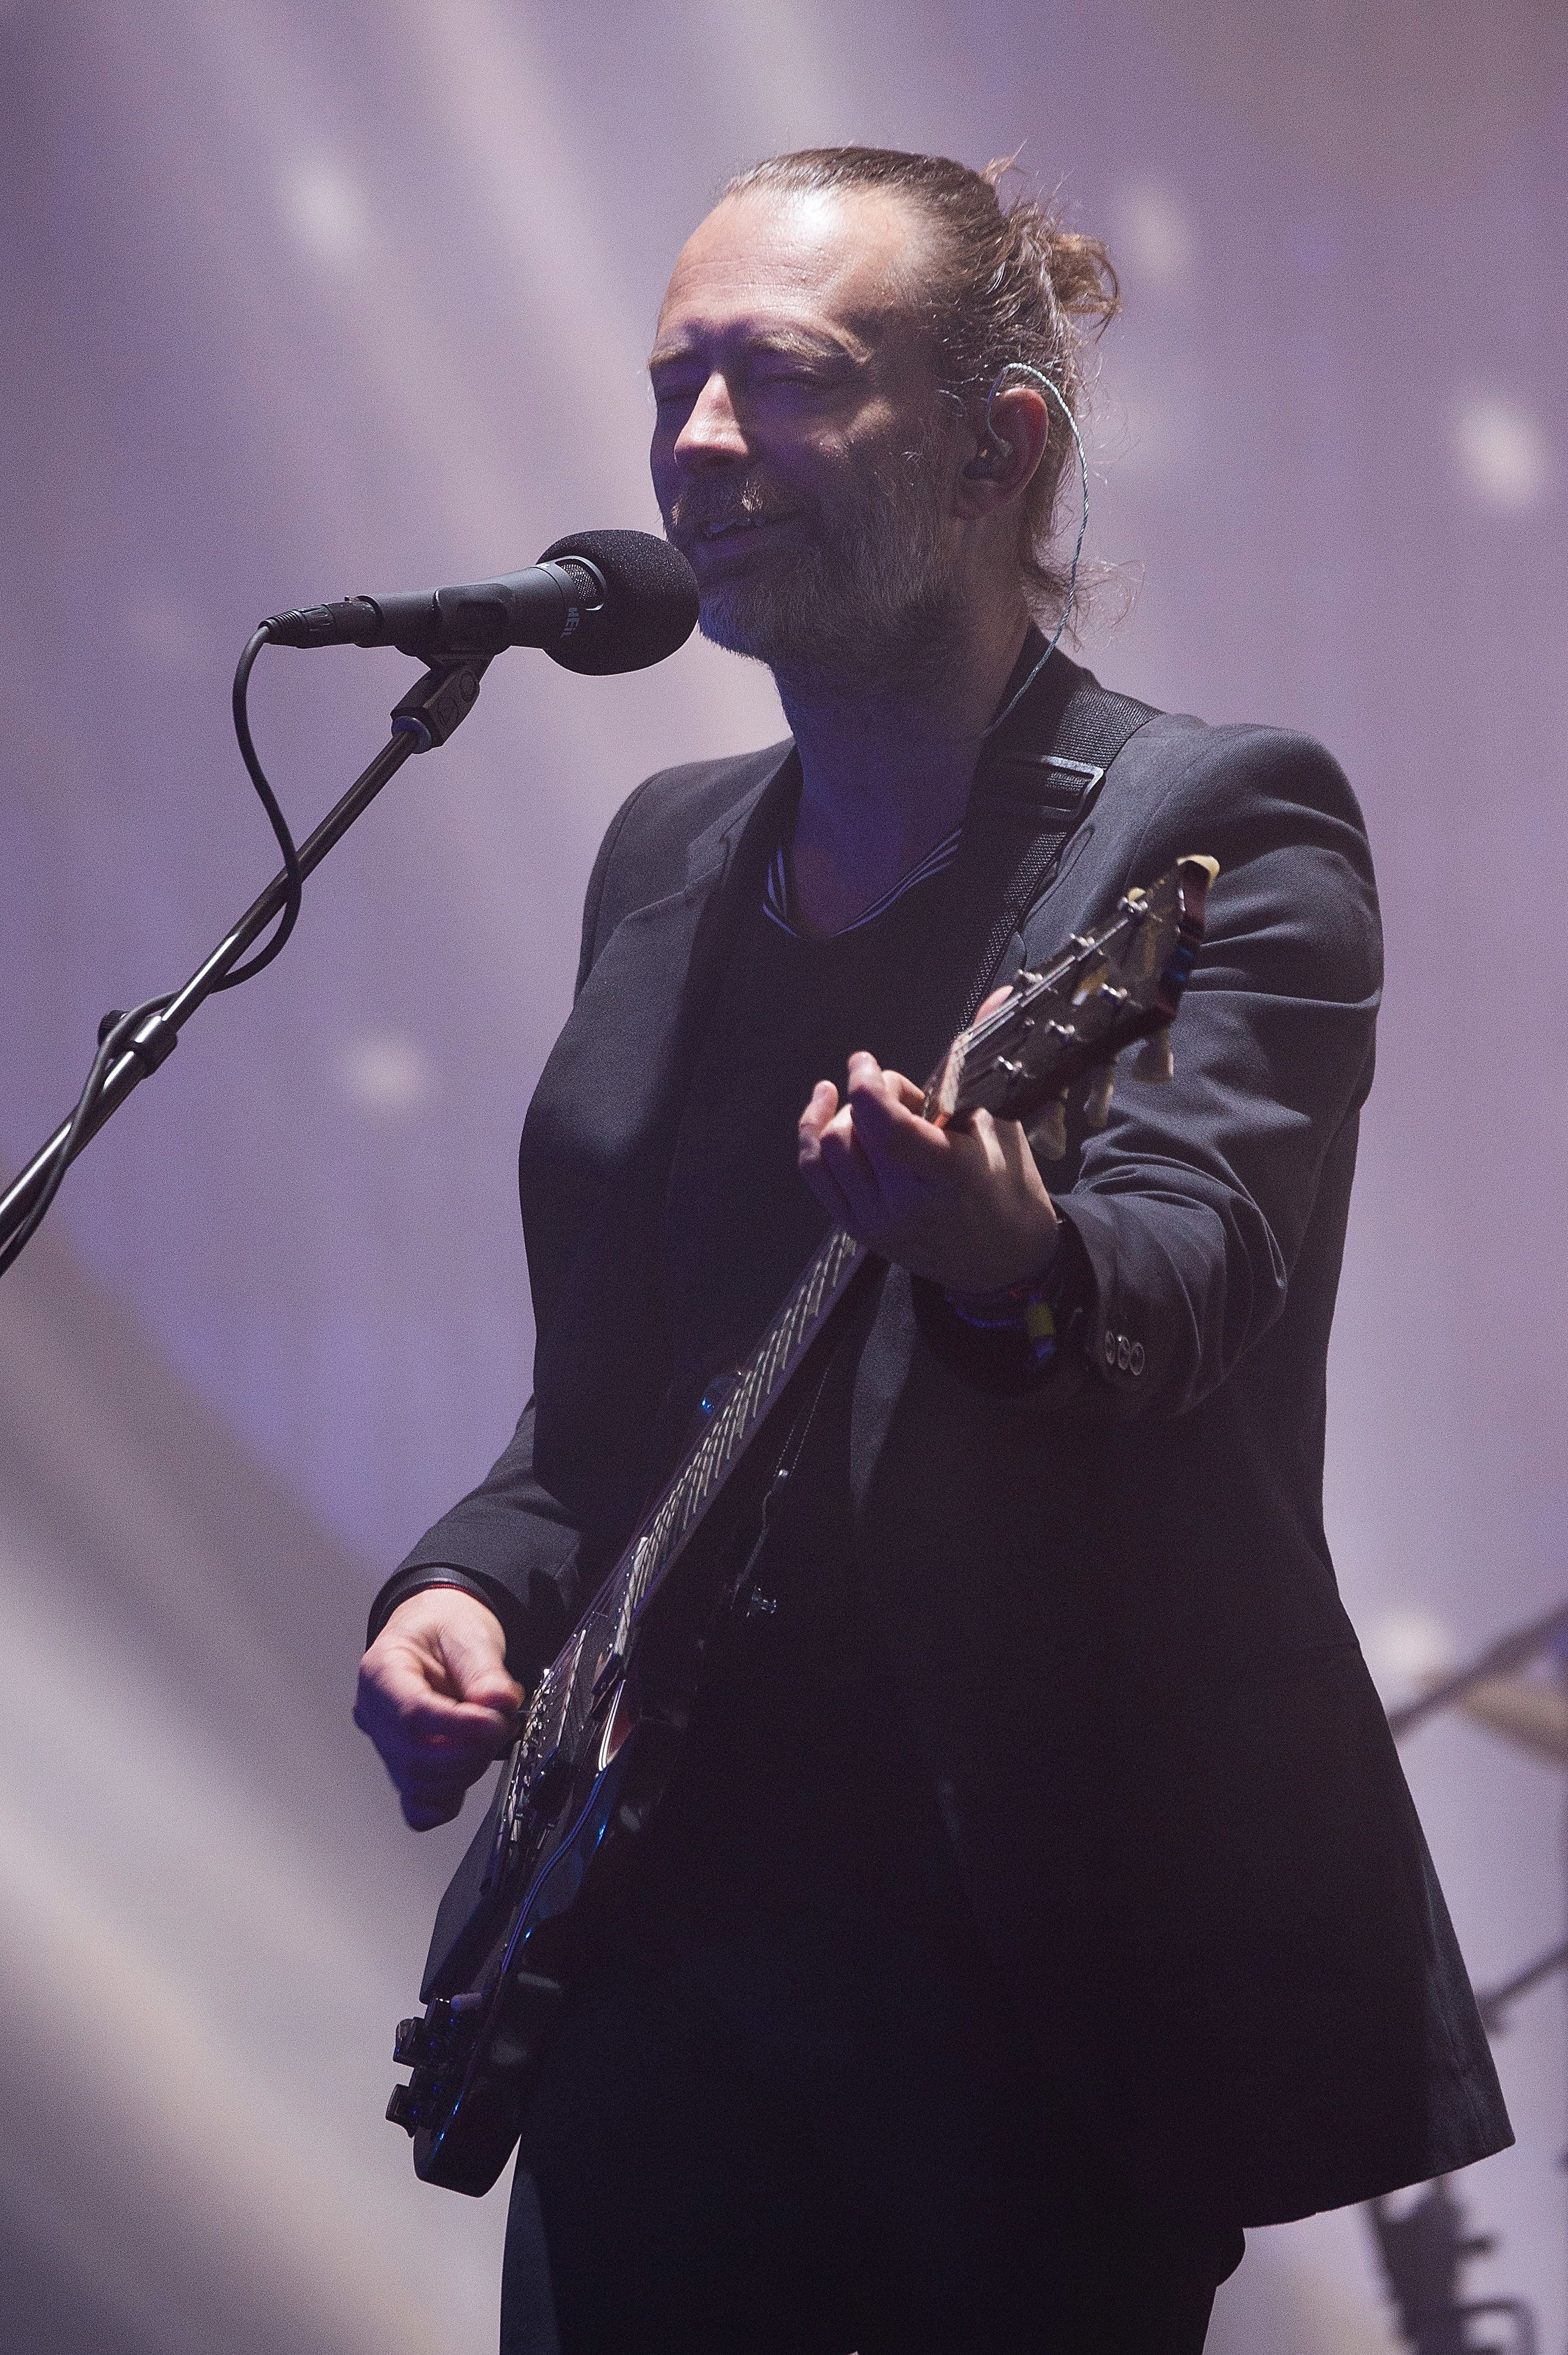 Radiohead's Thom Yorke Takes Aim At Theresa May During Glastonbury Headlining